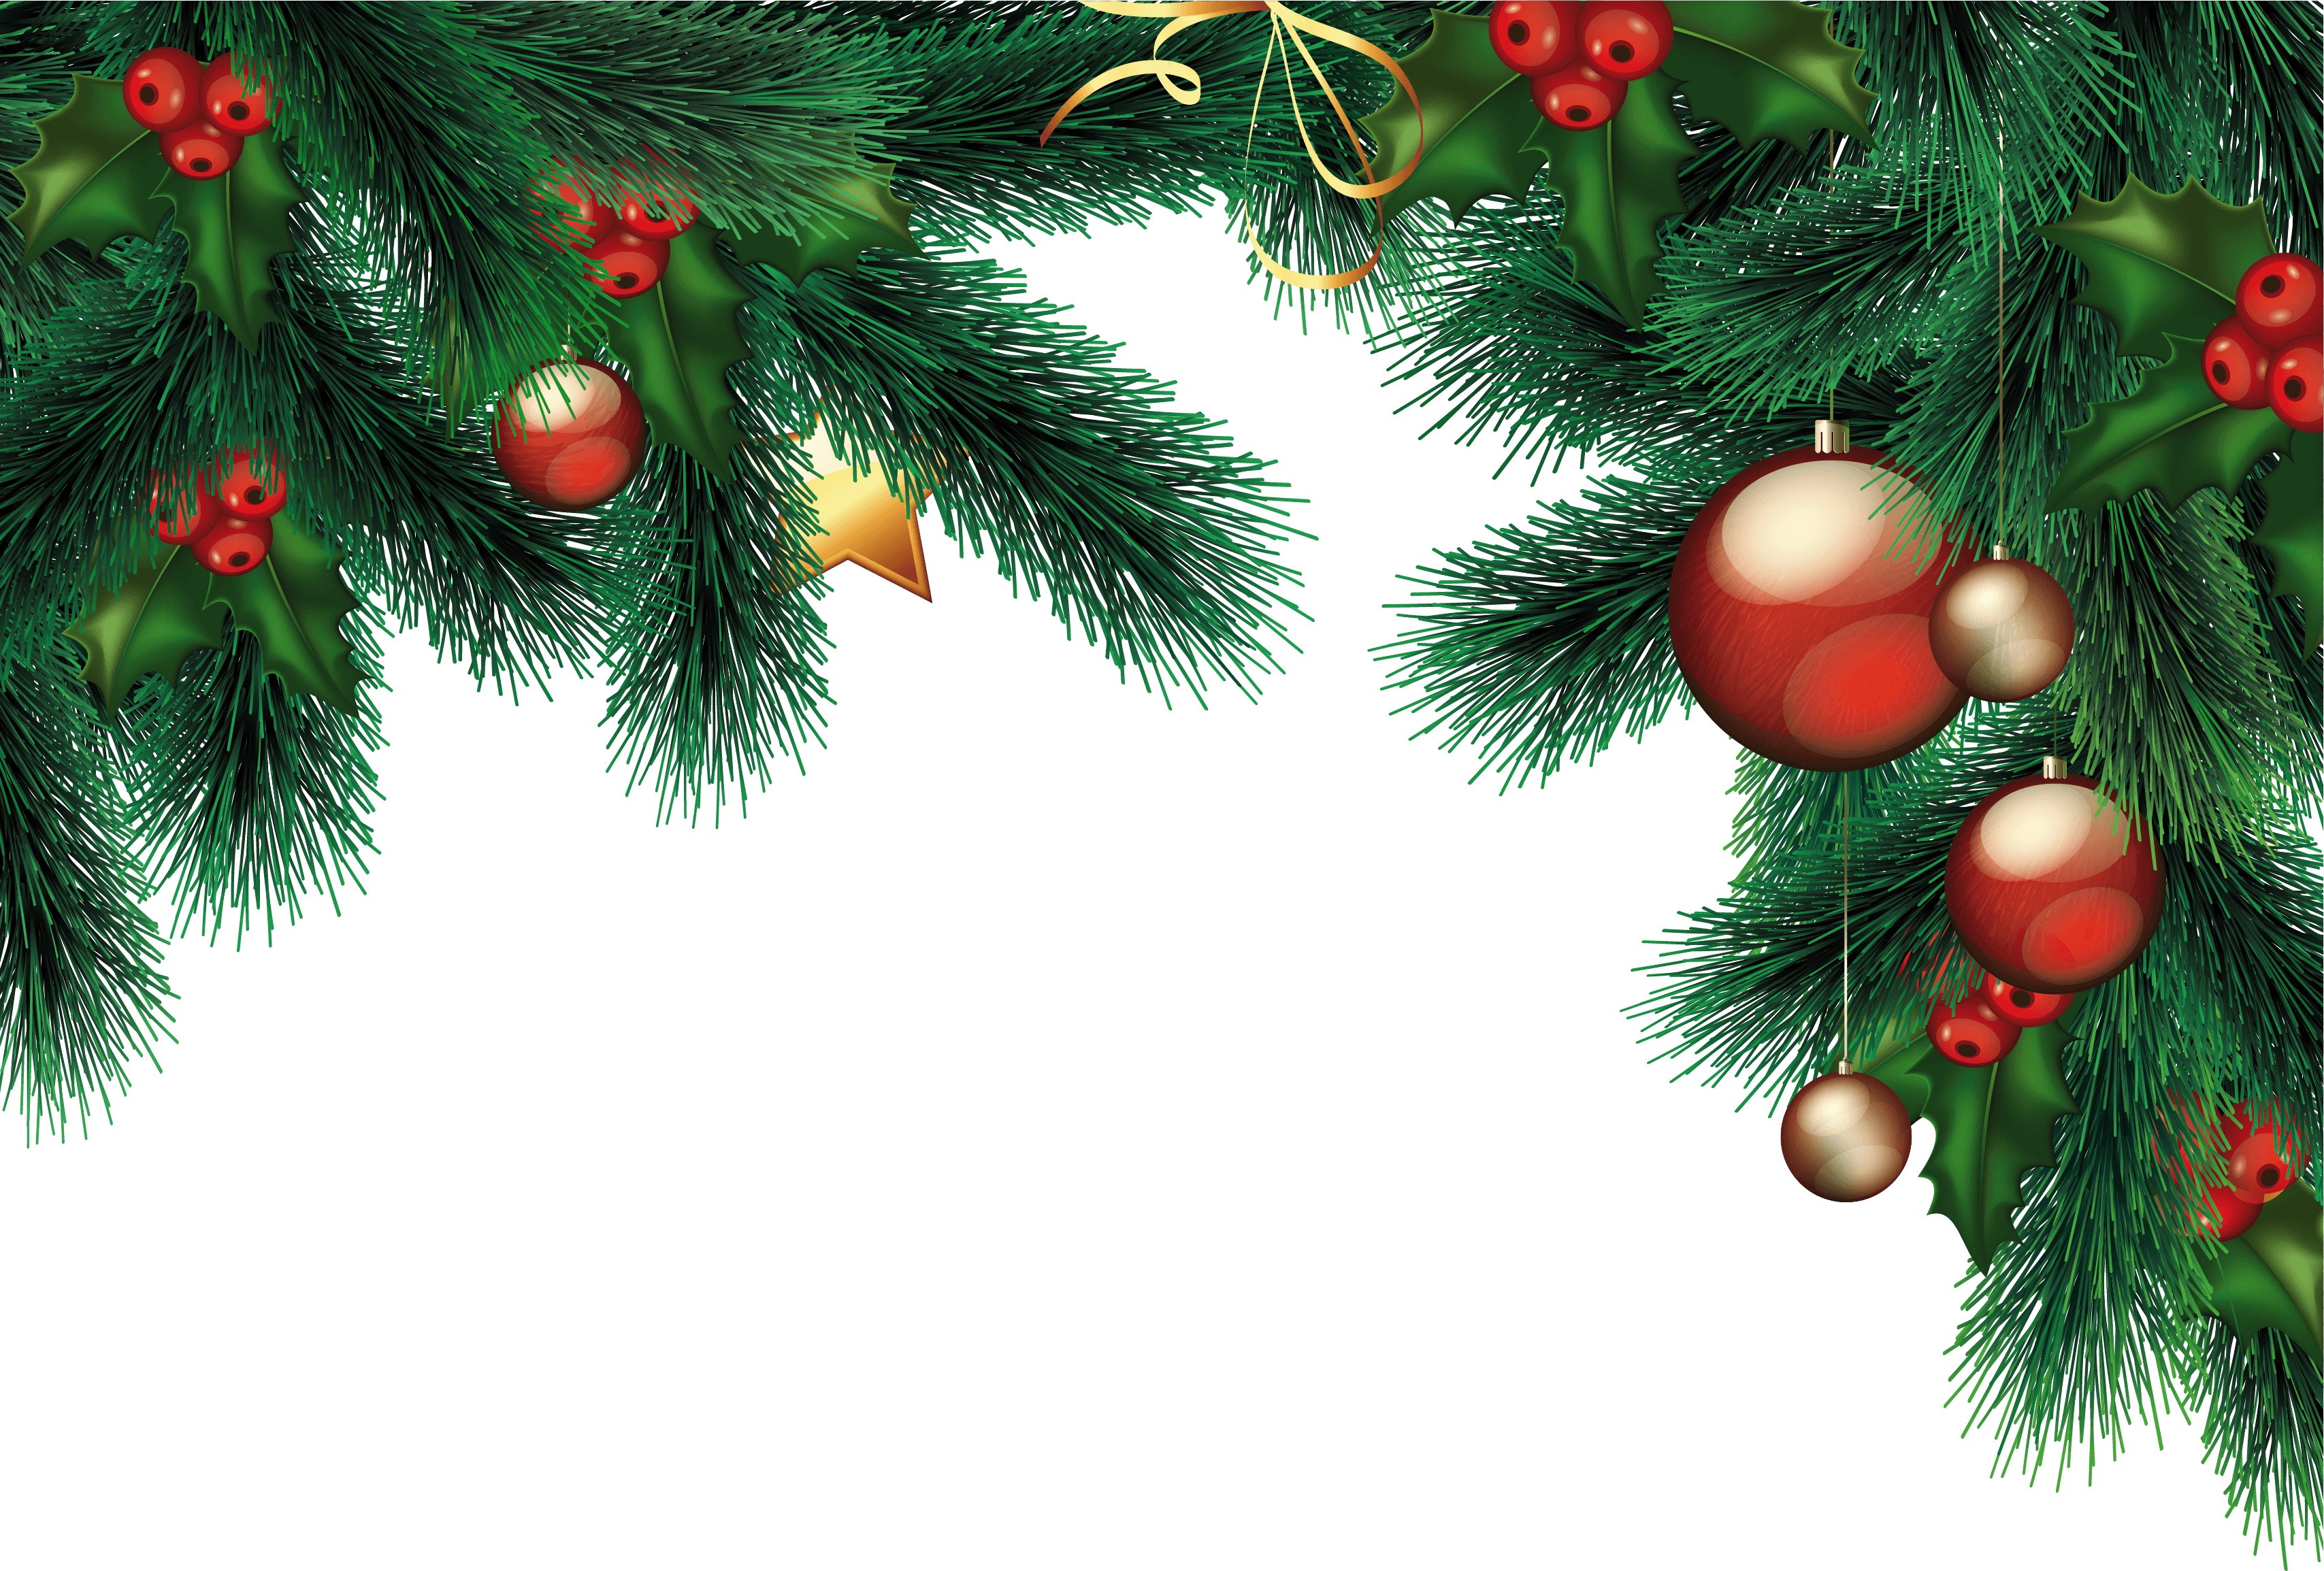 Download Christmas Png Image HQ PNG Image   FreePNGImg